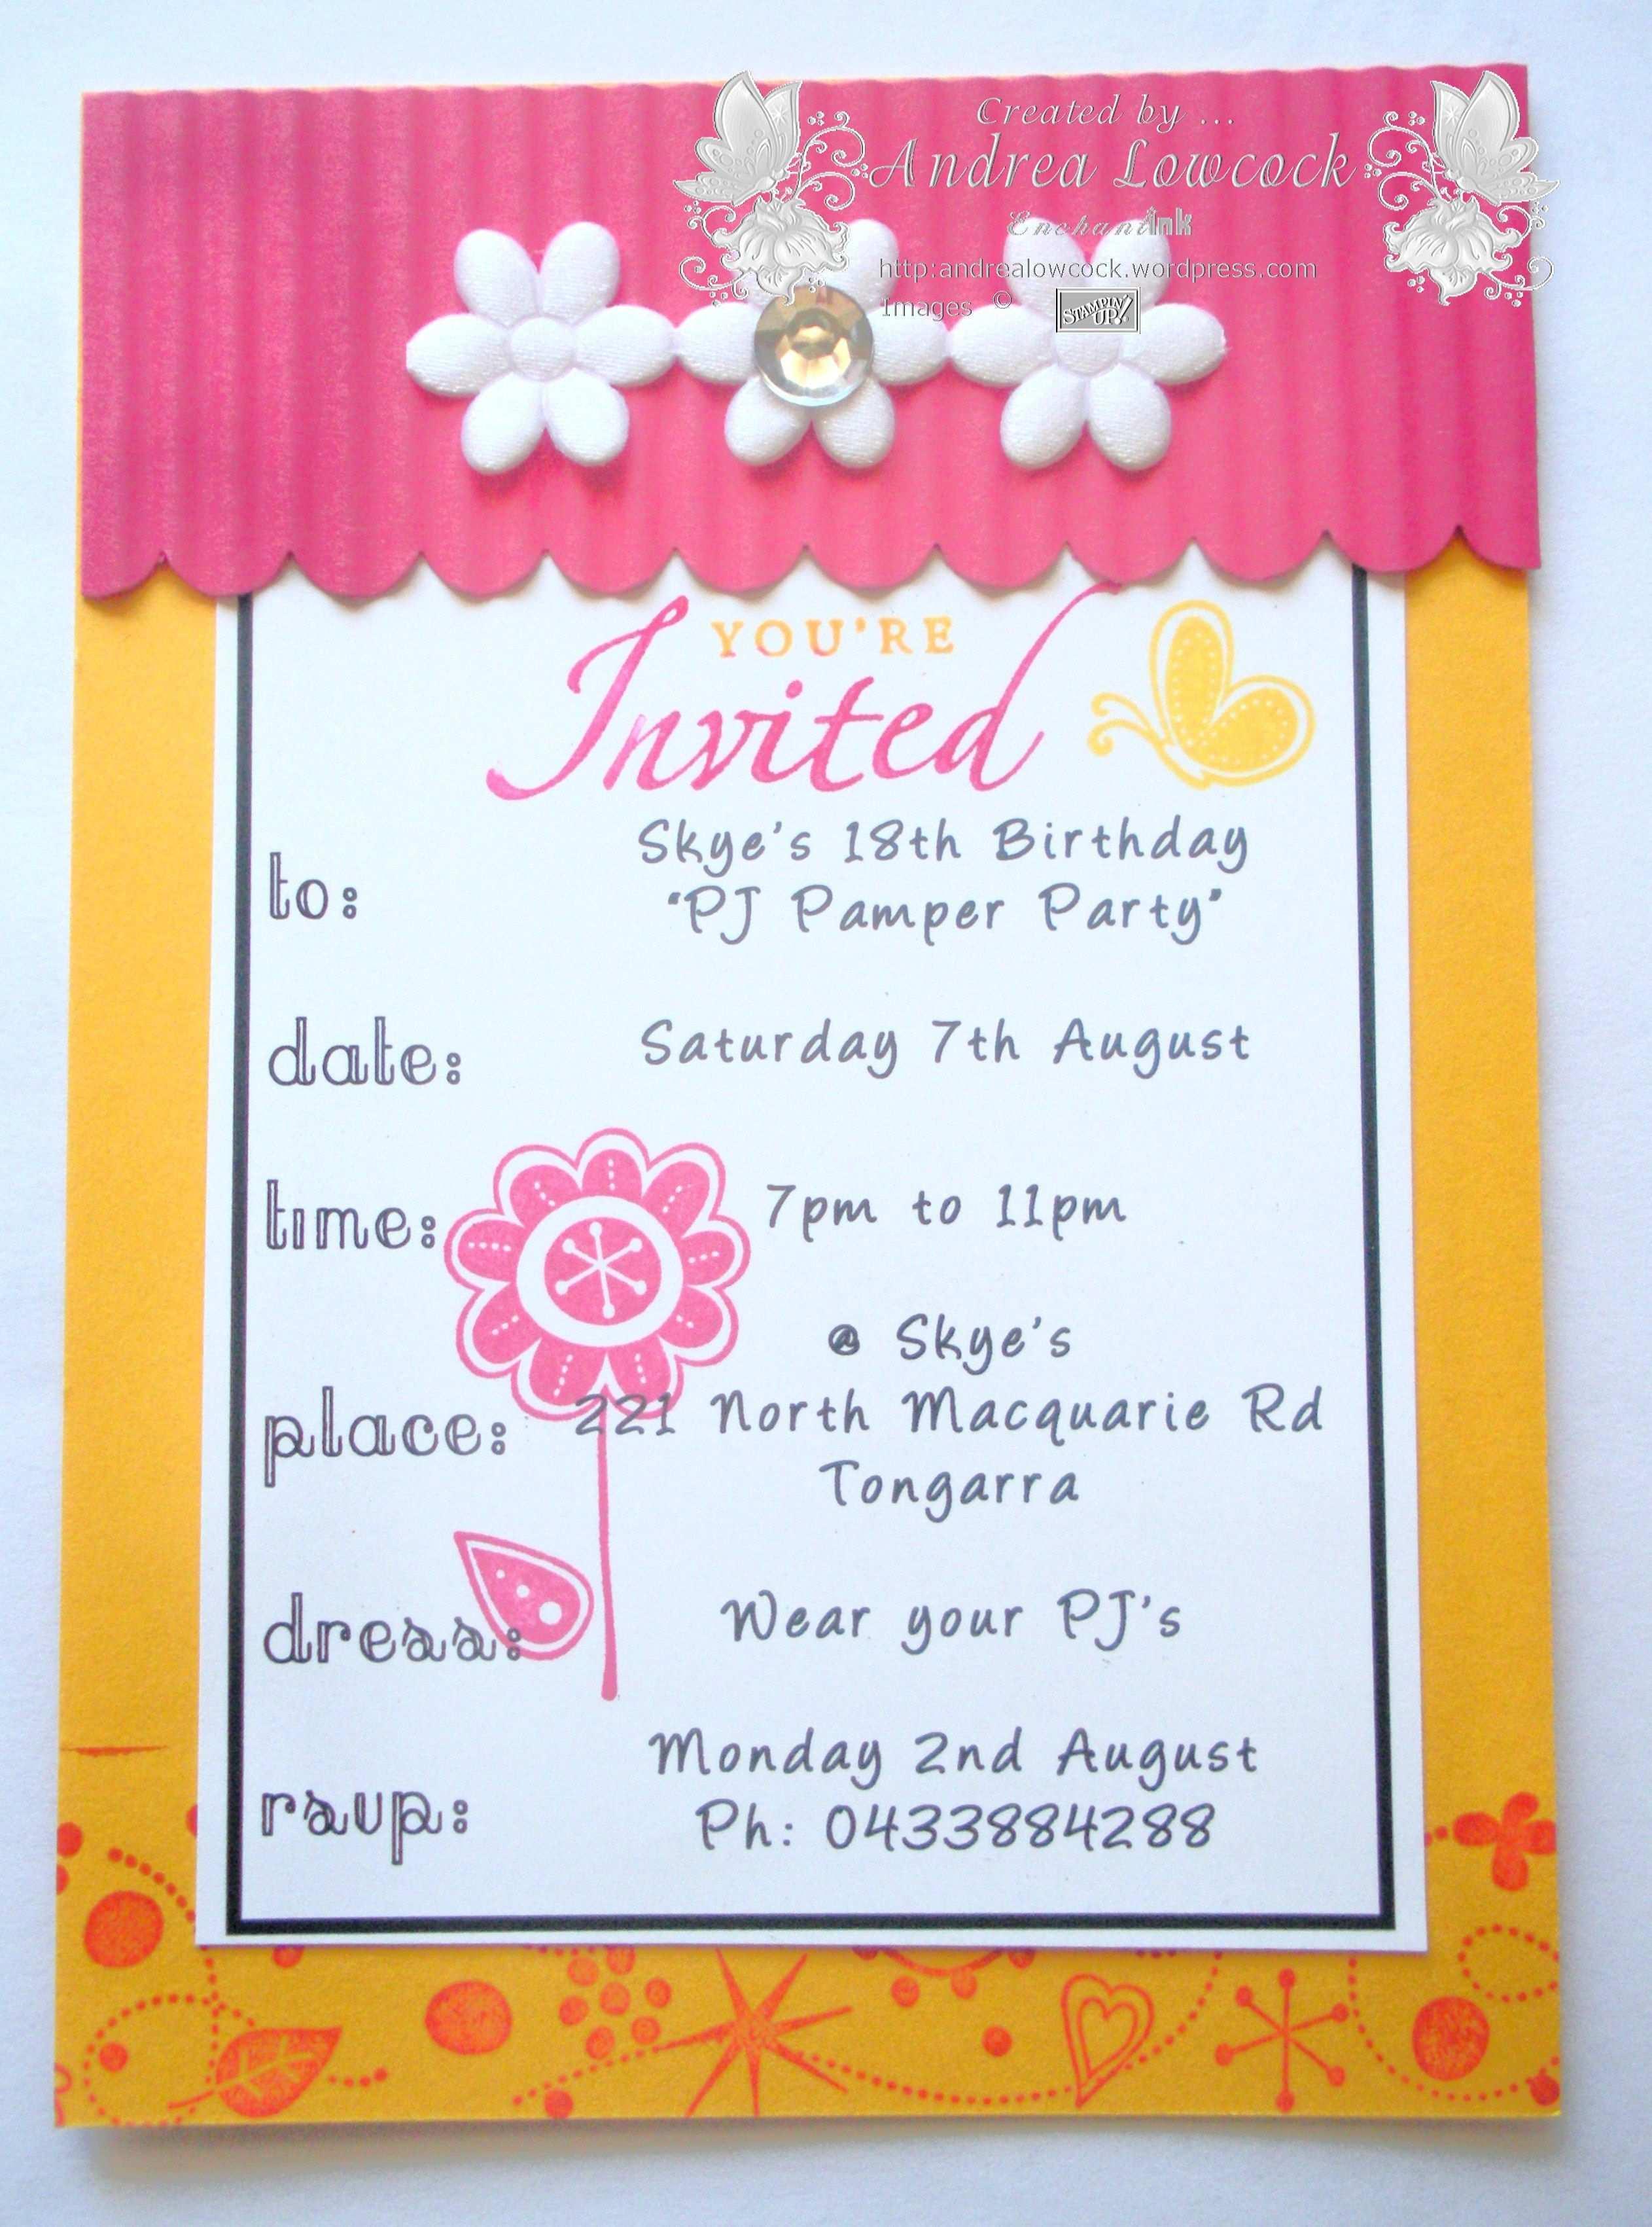 36 Format Birthday Invitation Card Sample Text For Free for Birthday Invitation Card Sample Text